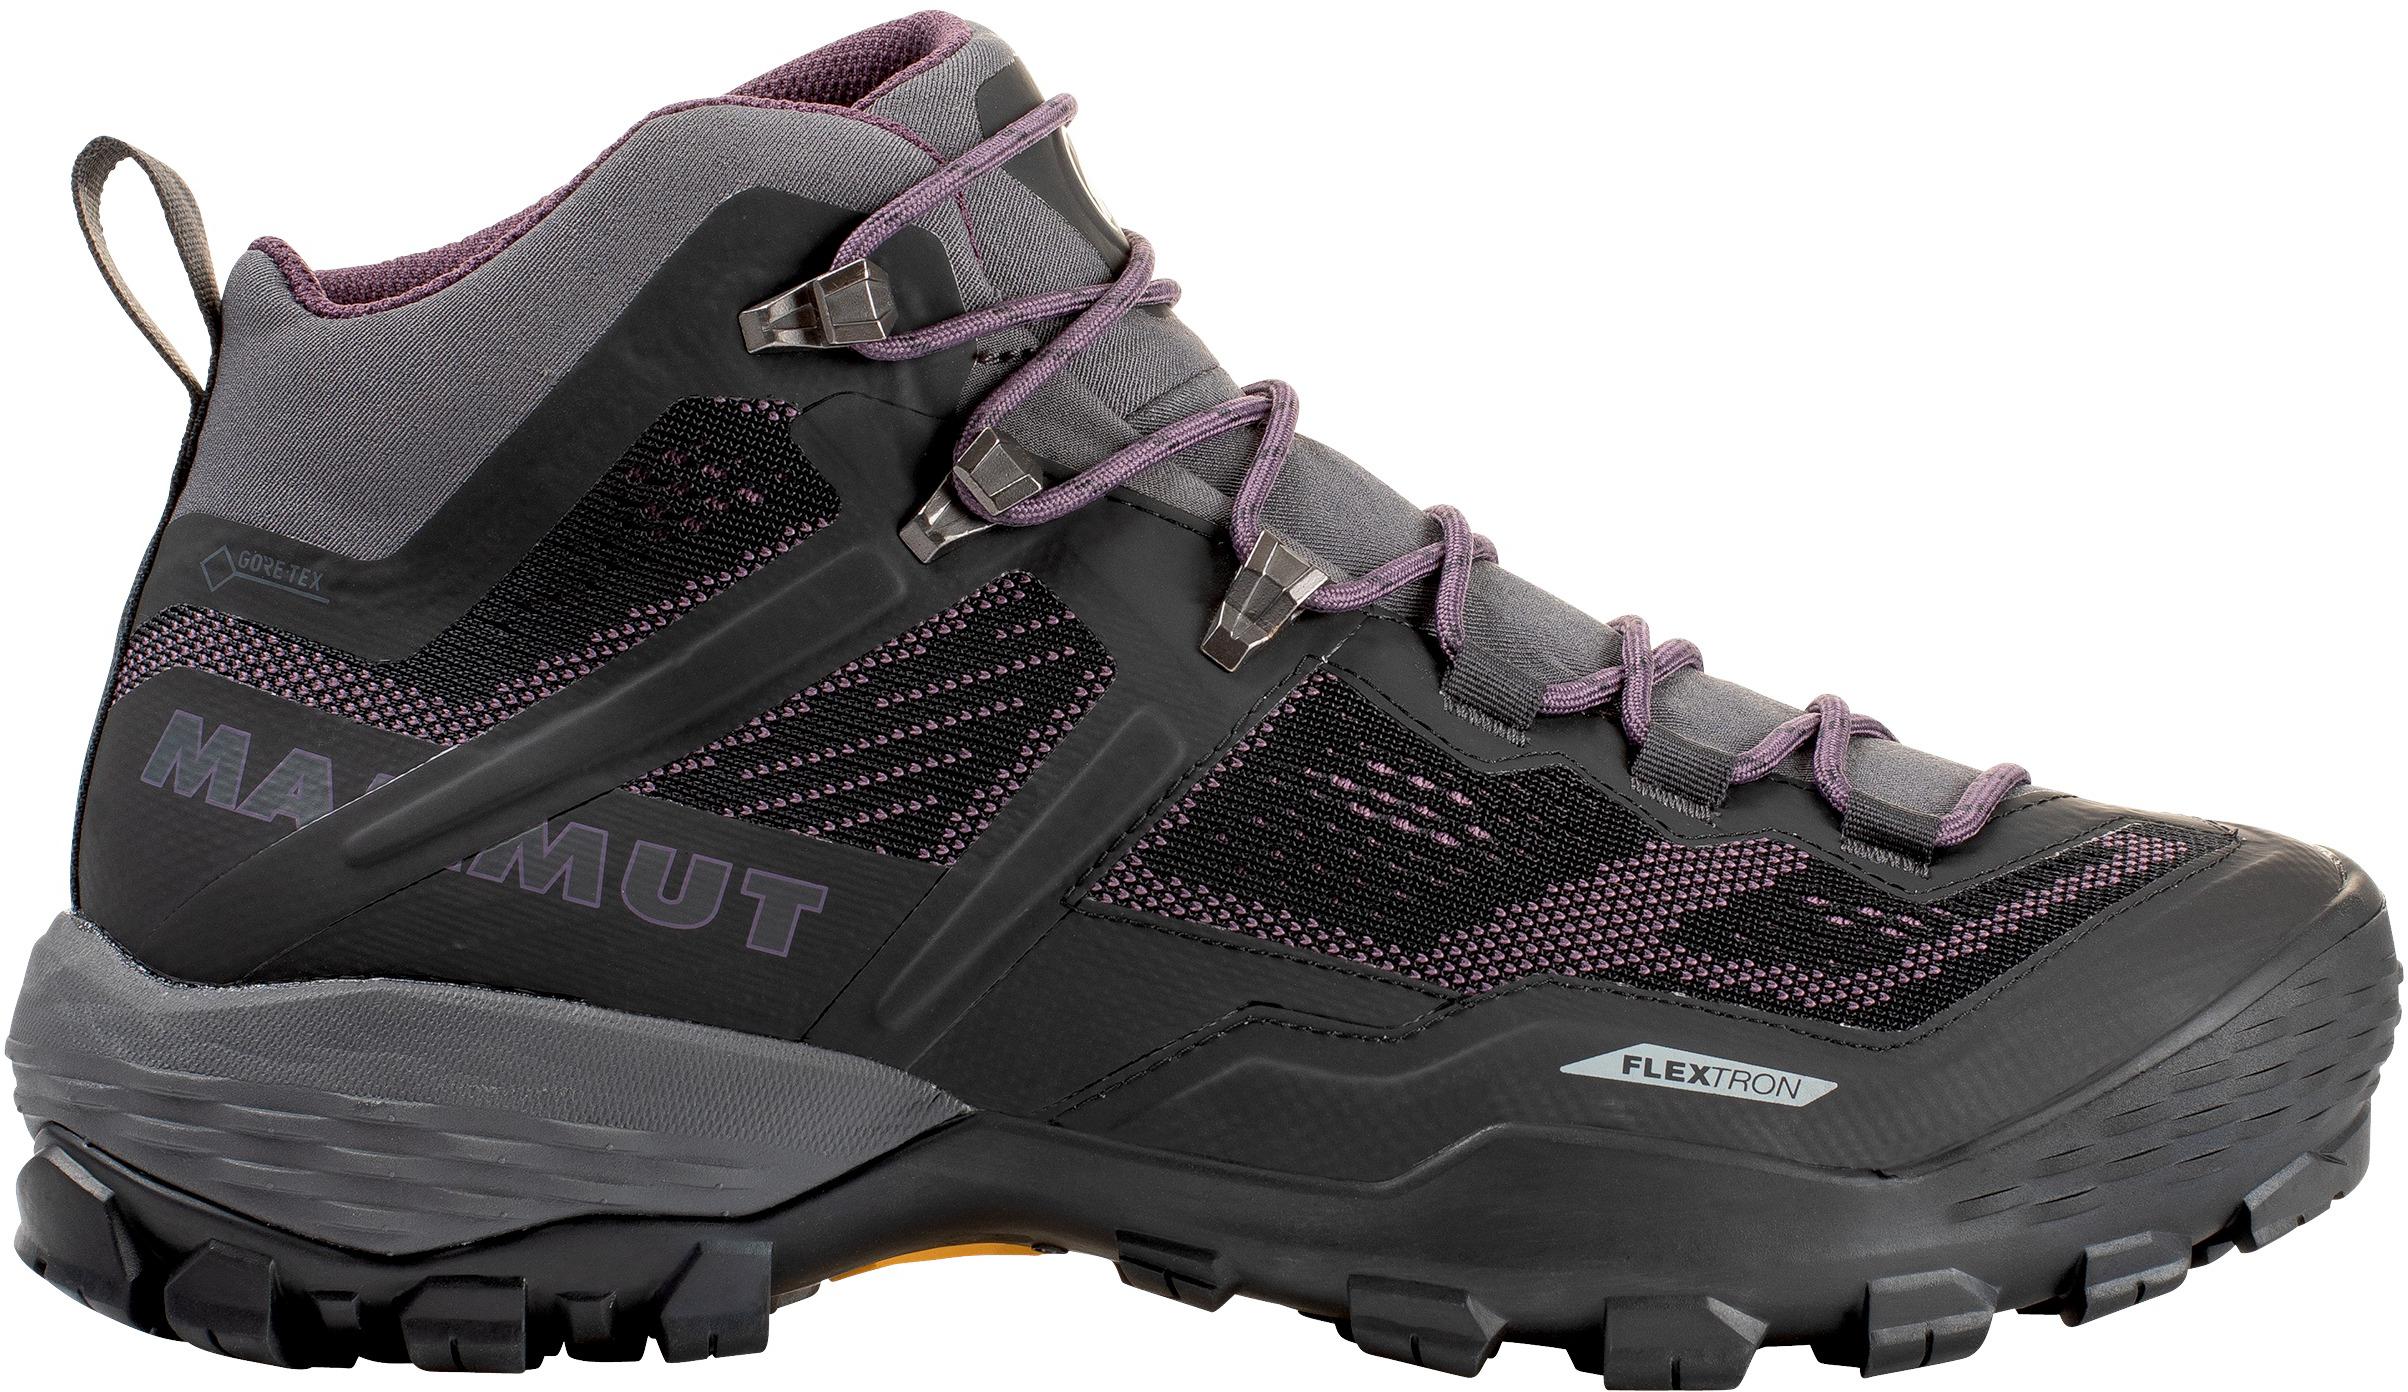 693e2bc08f4 Mammut Ducan Mid Gore-Tex Hiking Boots - Women's